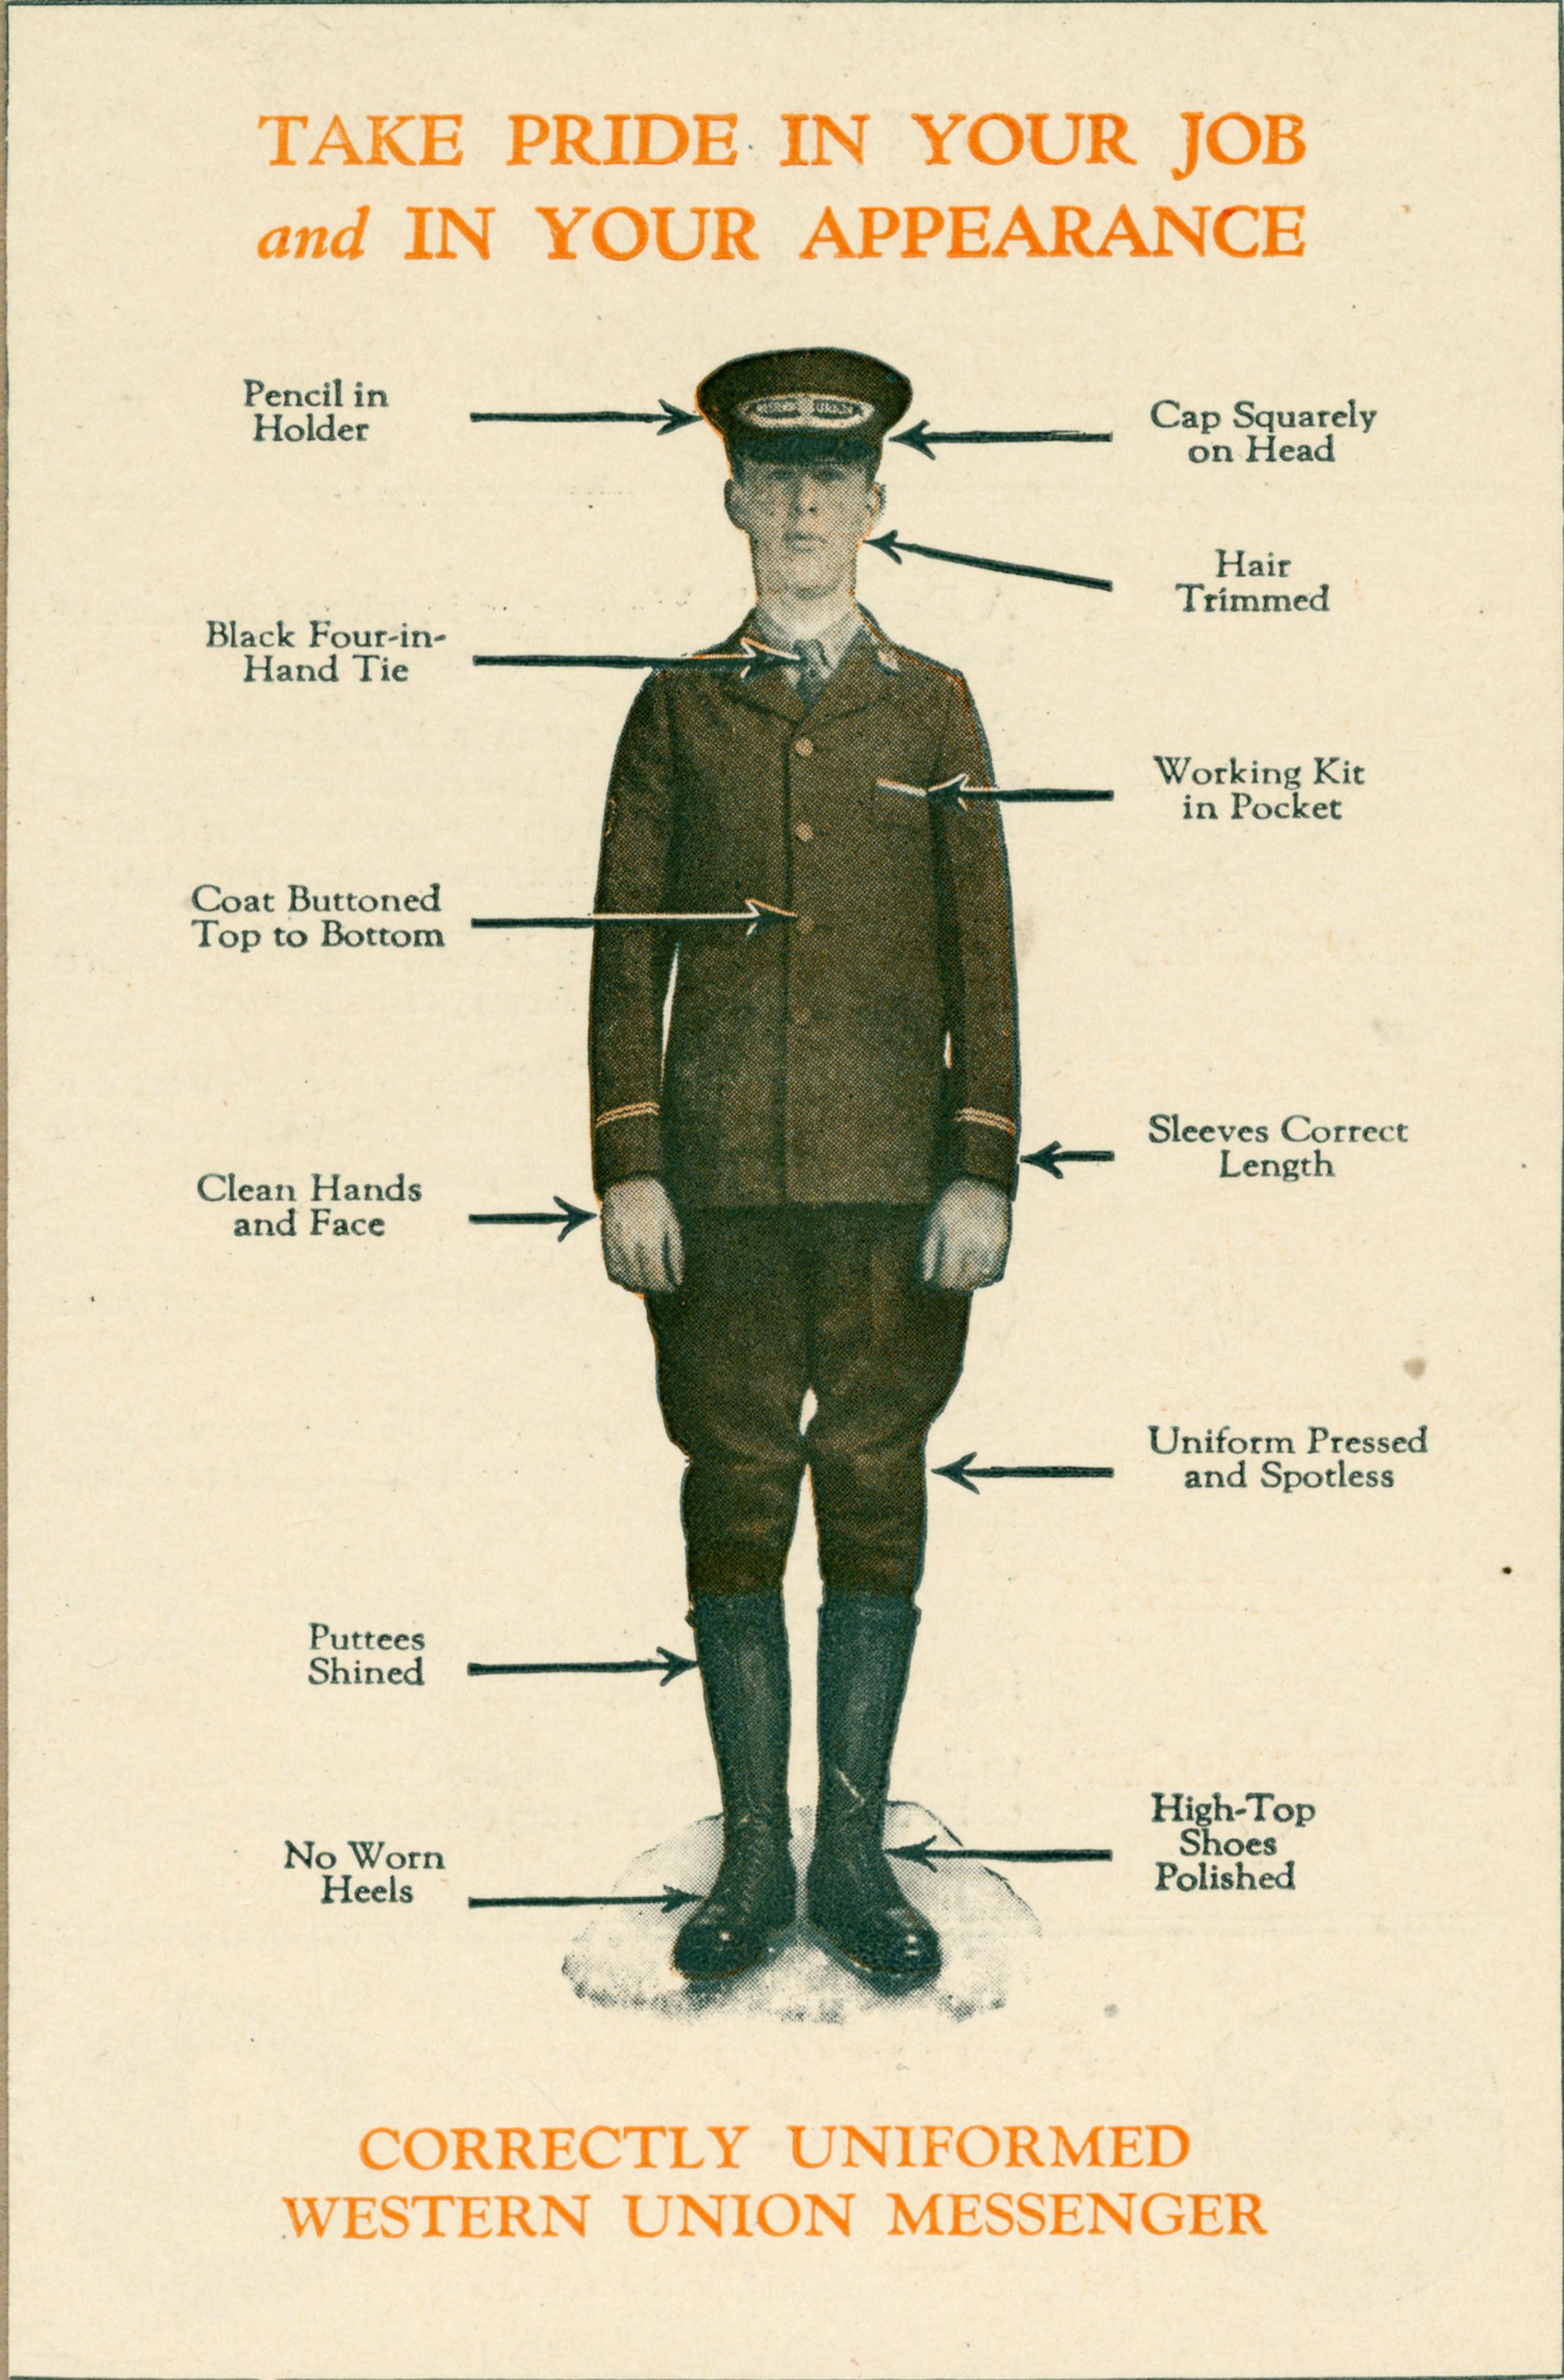 Dress code for WesternUnion messengers. Proper attire